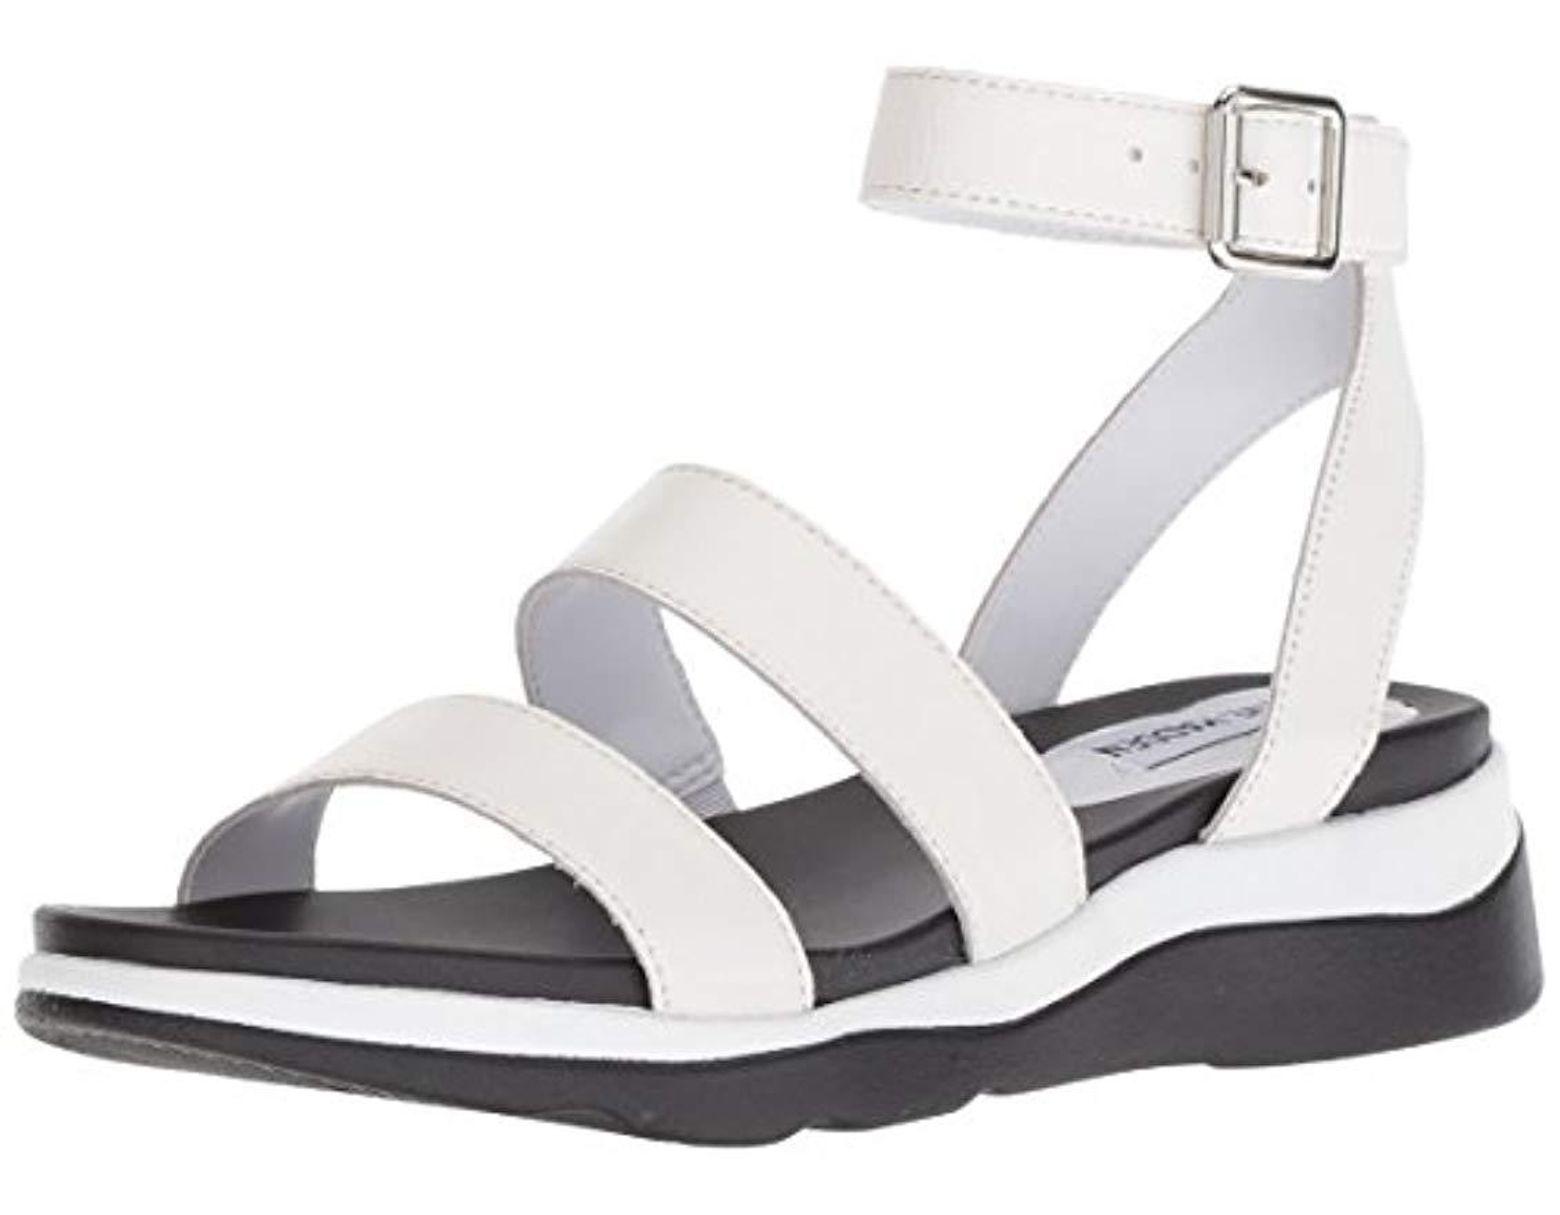 9b0c75f8b5030 Women's White Relish Sandal